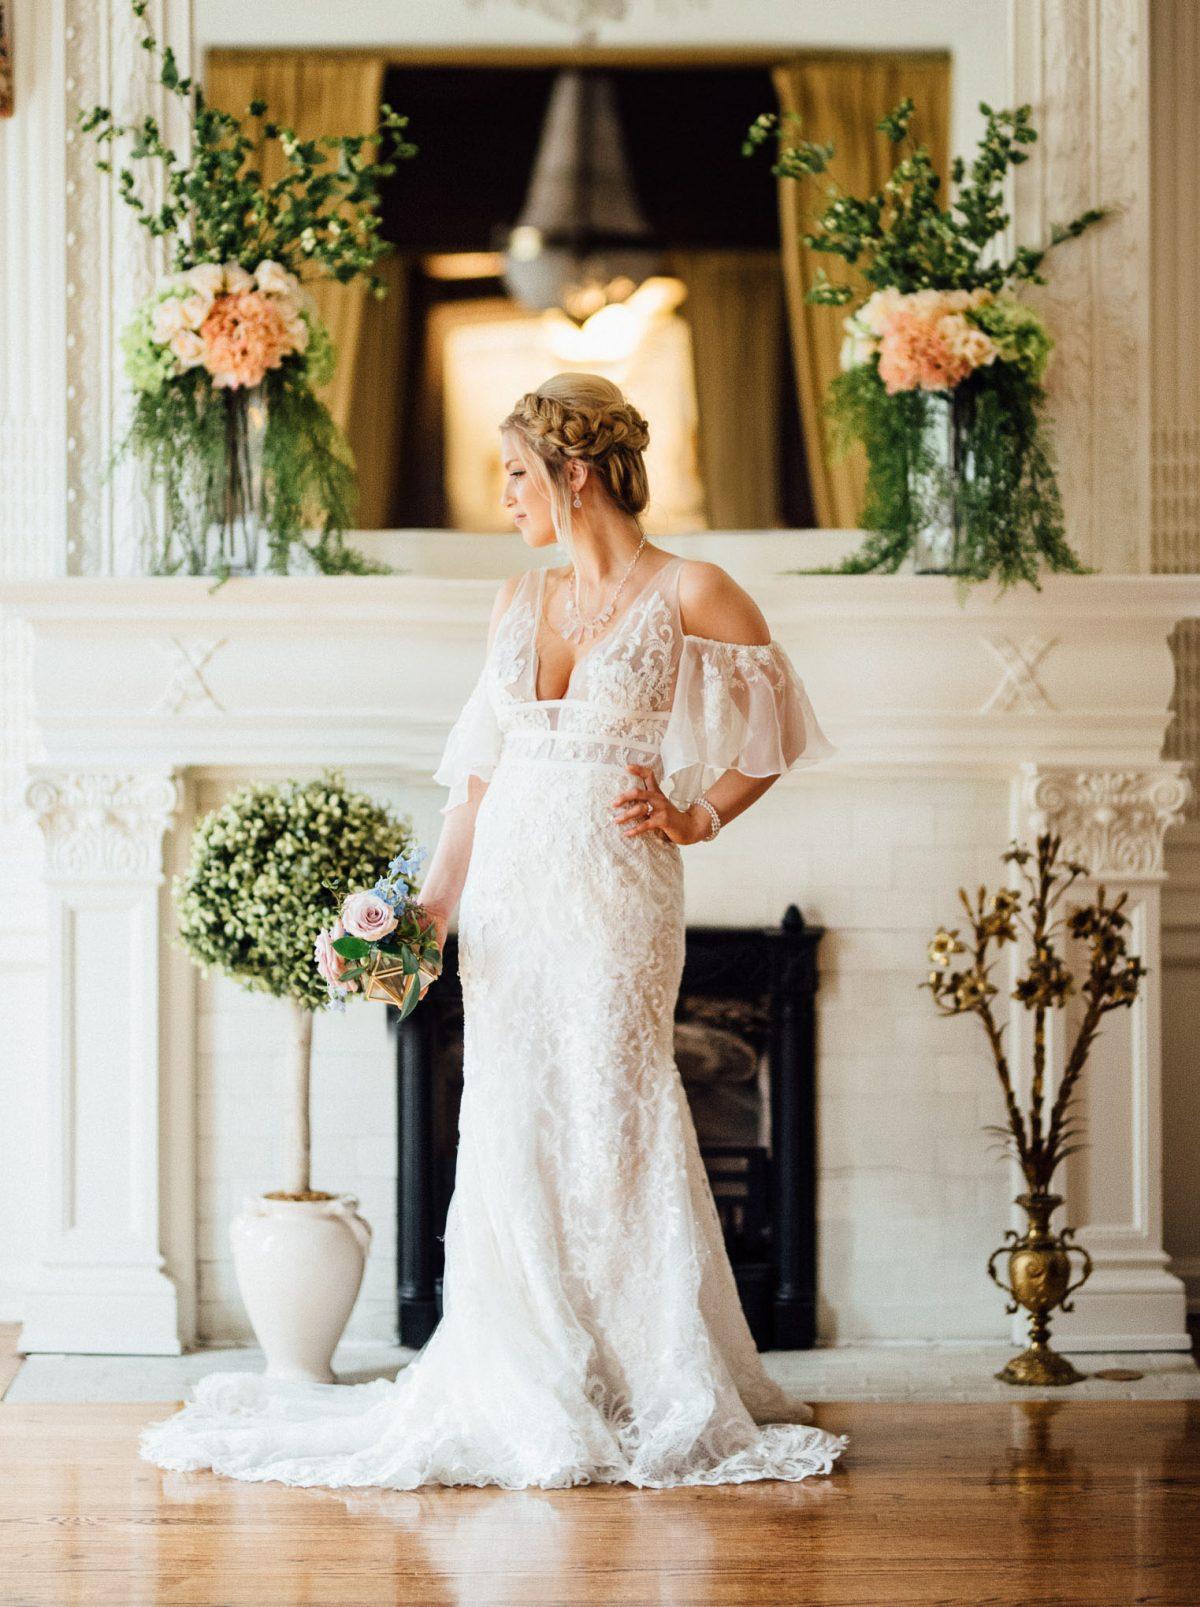 bridal-portrait-e1491336415927 FAQs